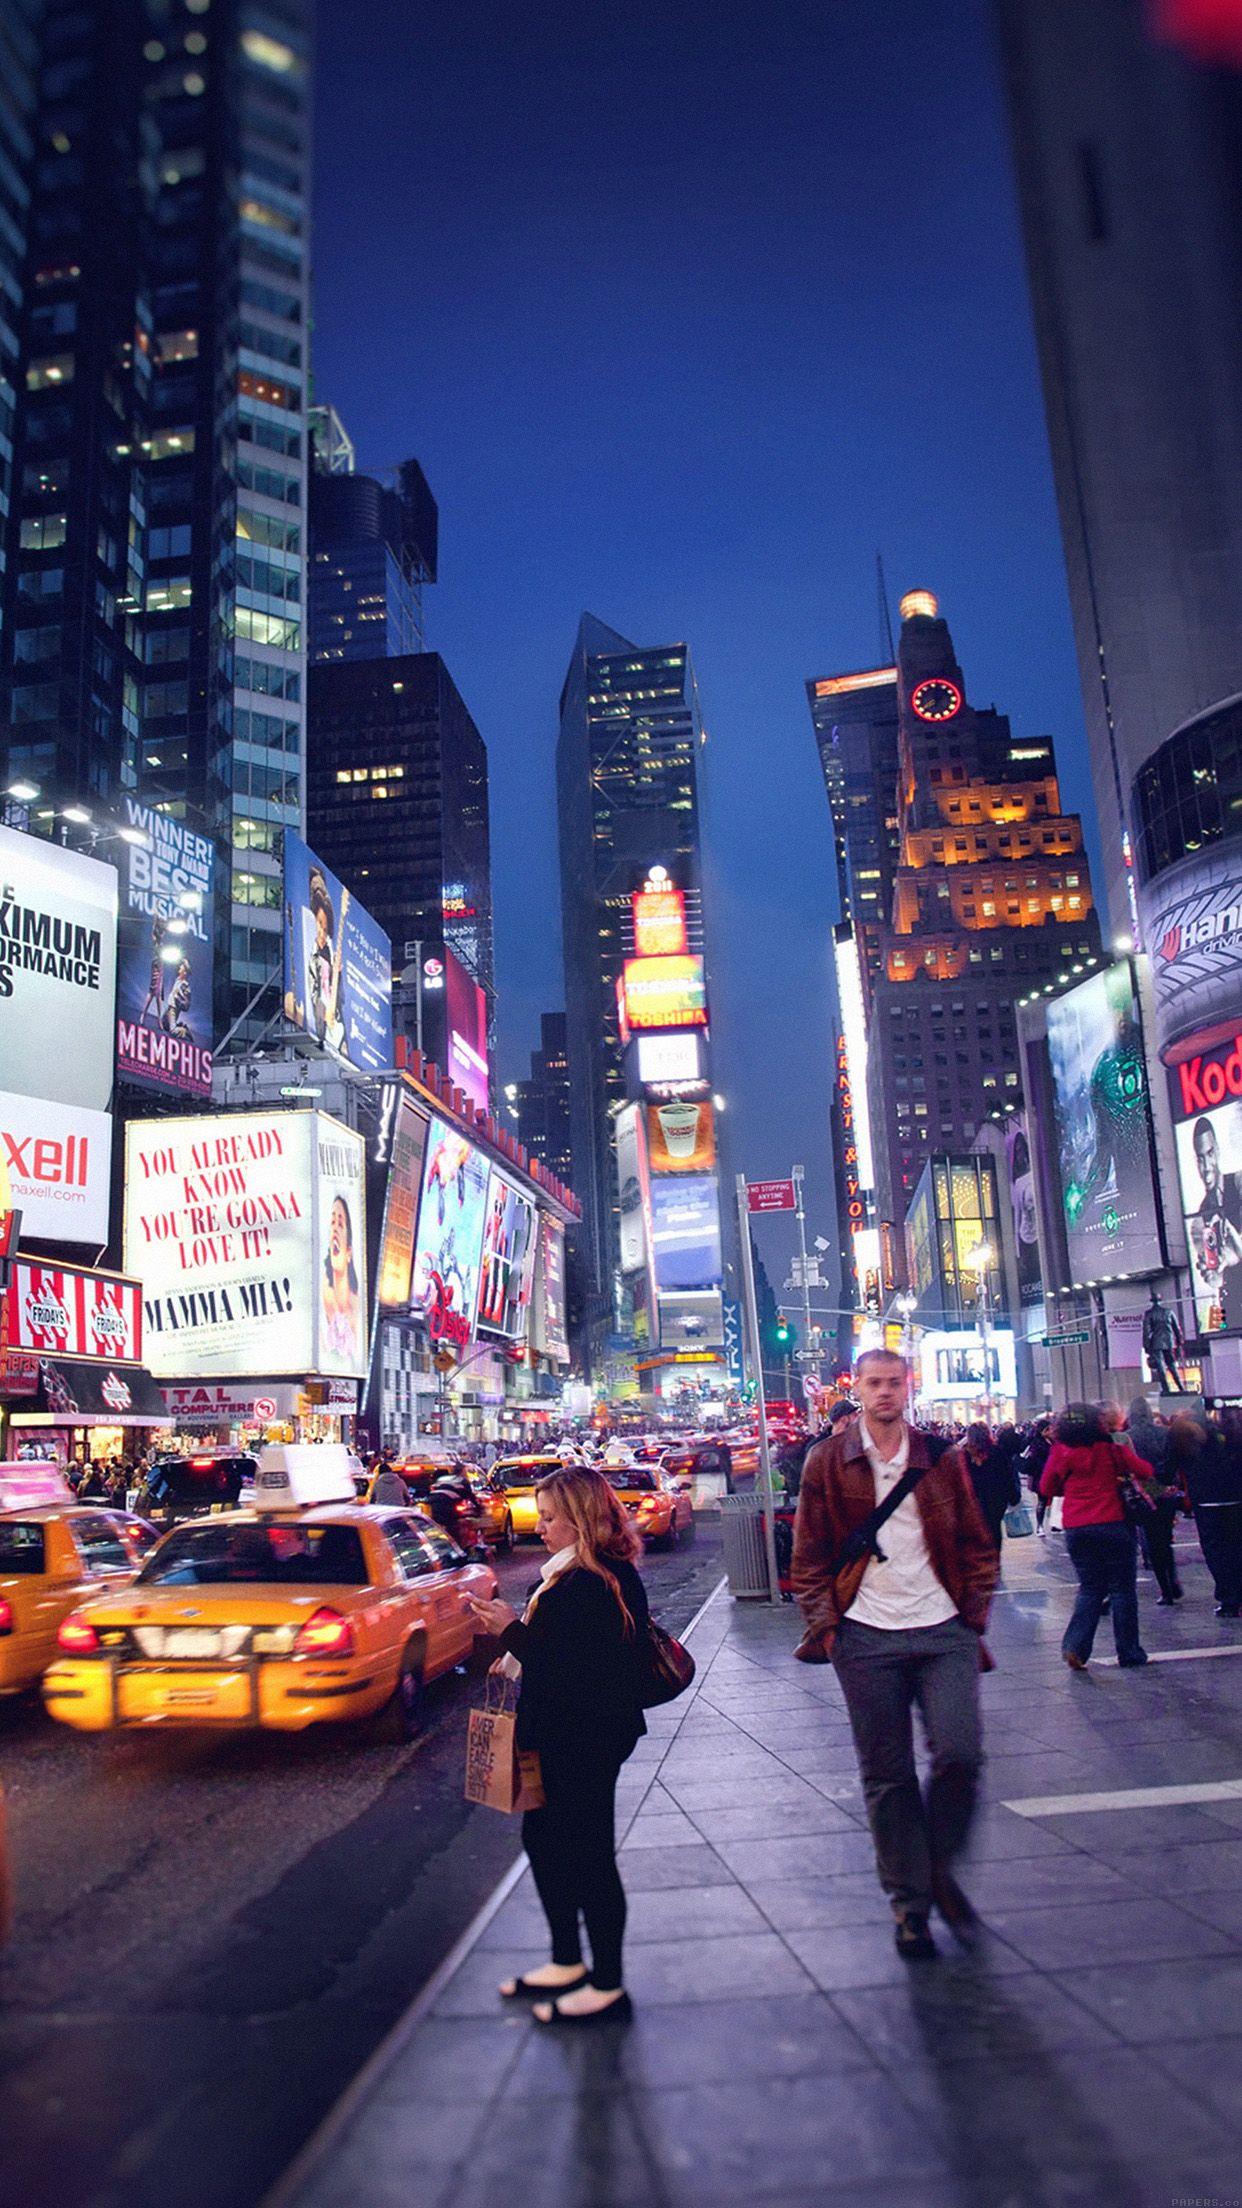 Https All Images Net Iphone Wallpaper New York Hd 4k 235 Iphone